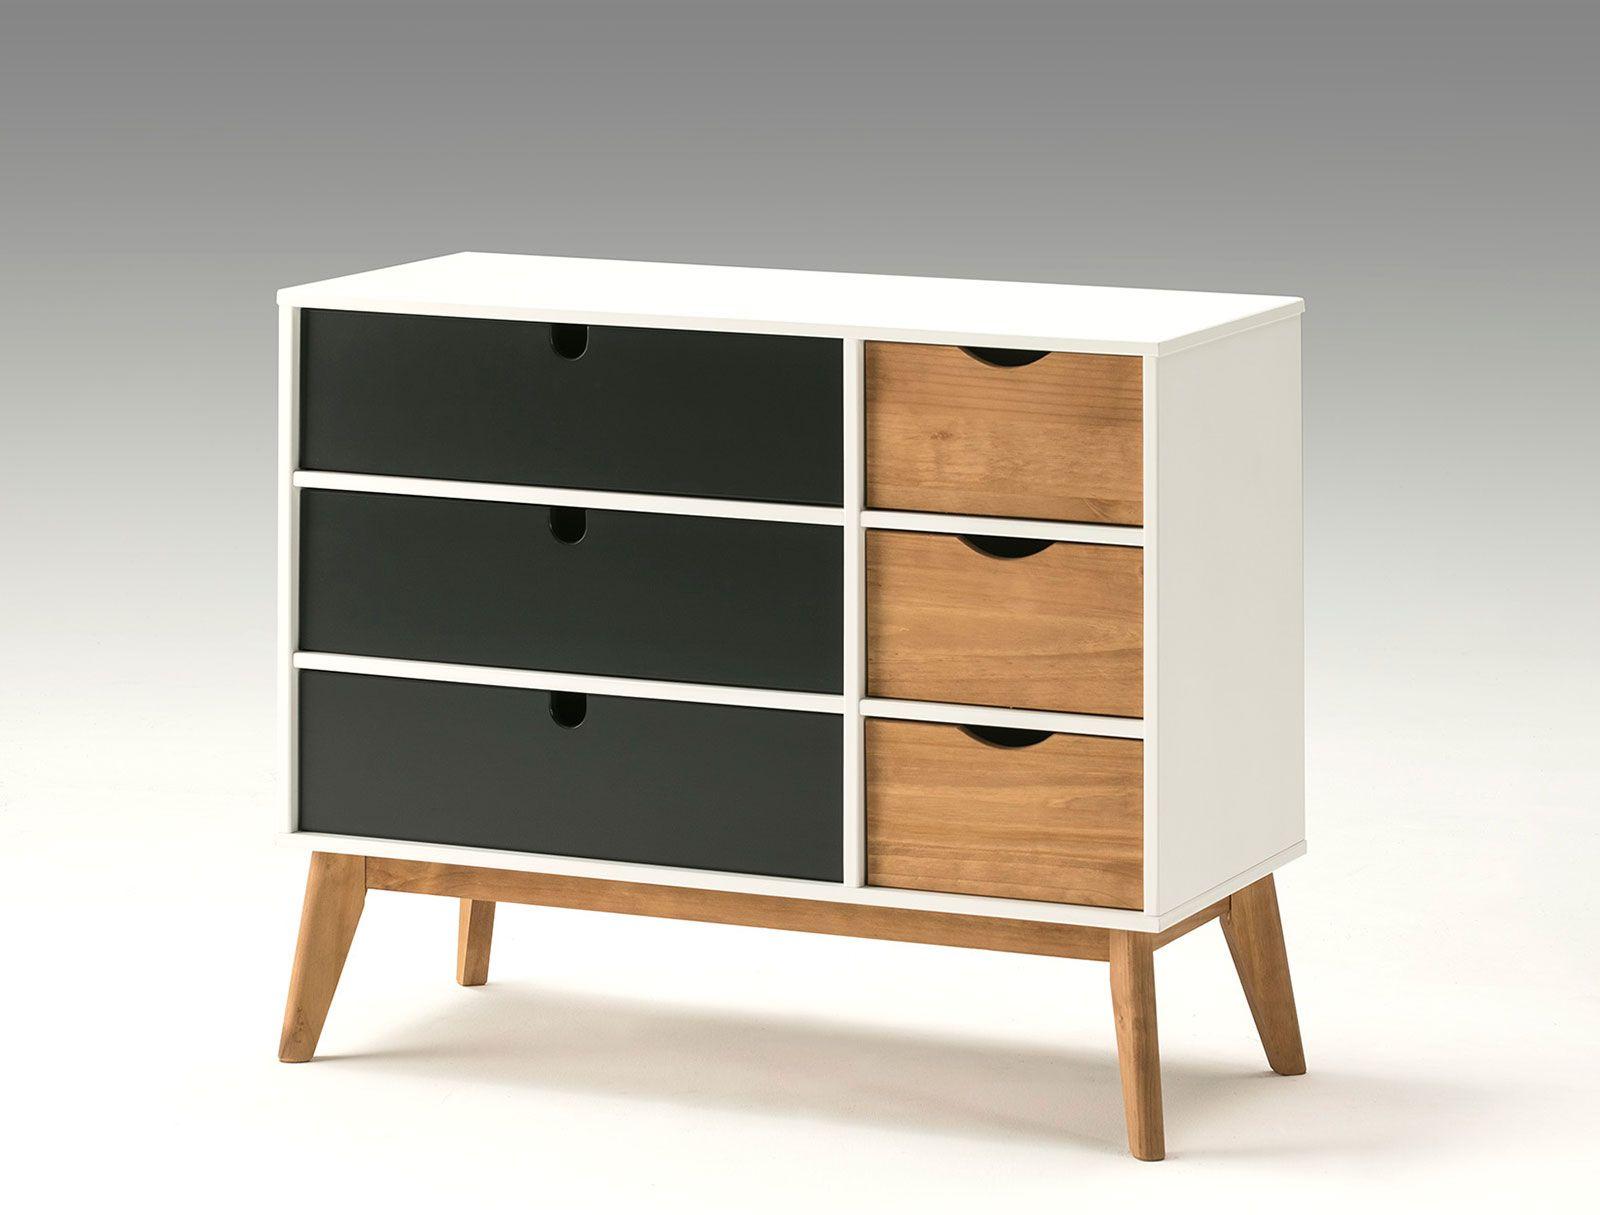 Descubre Comoda Cris Barato Furniture Dresser Decor